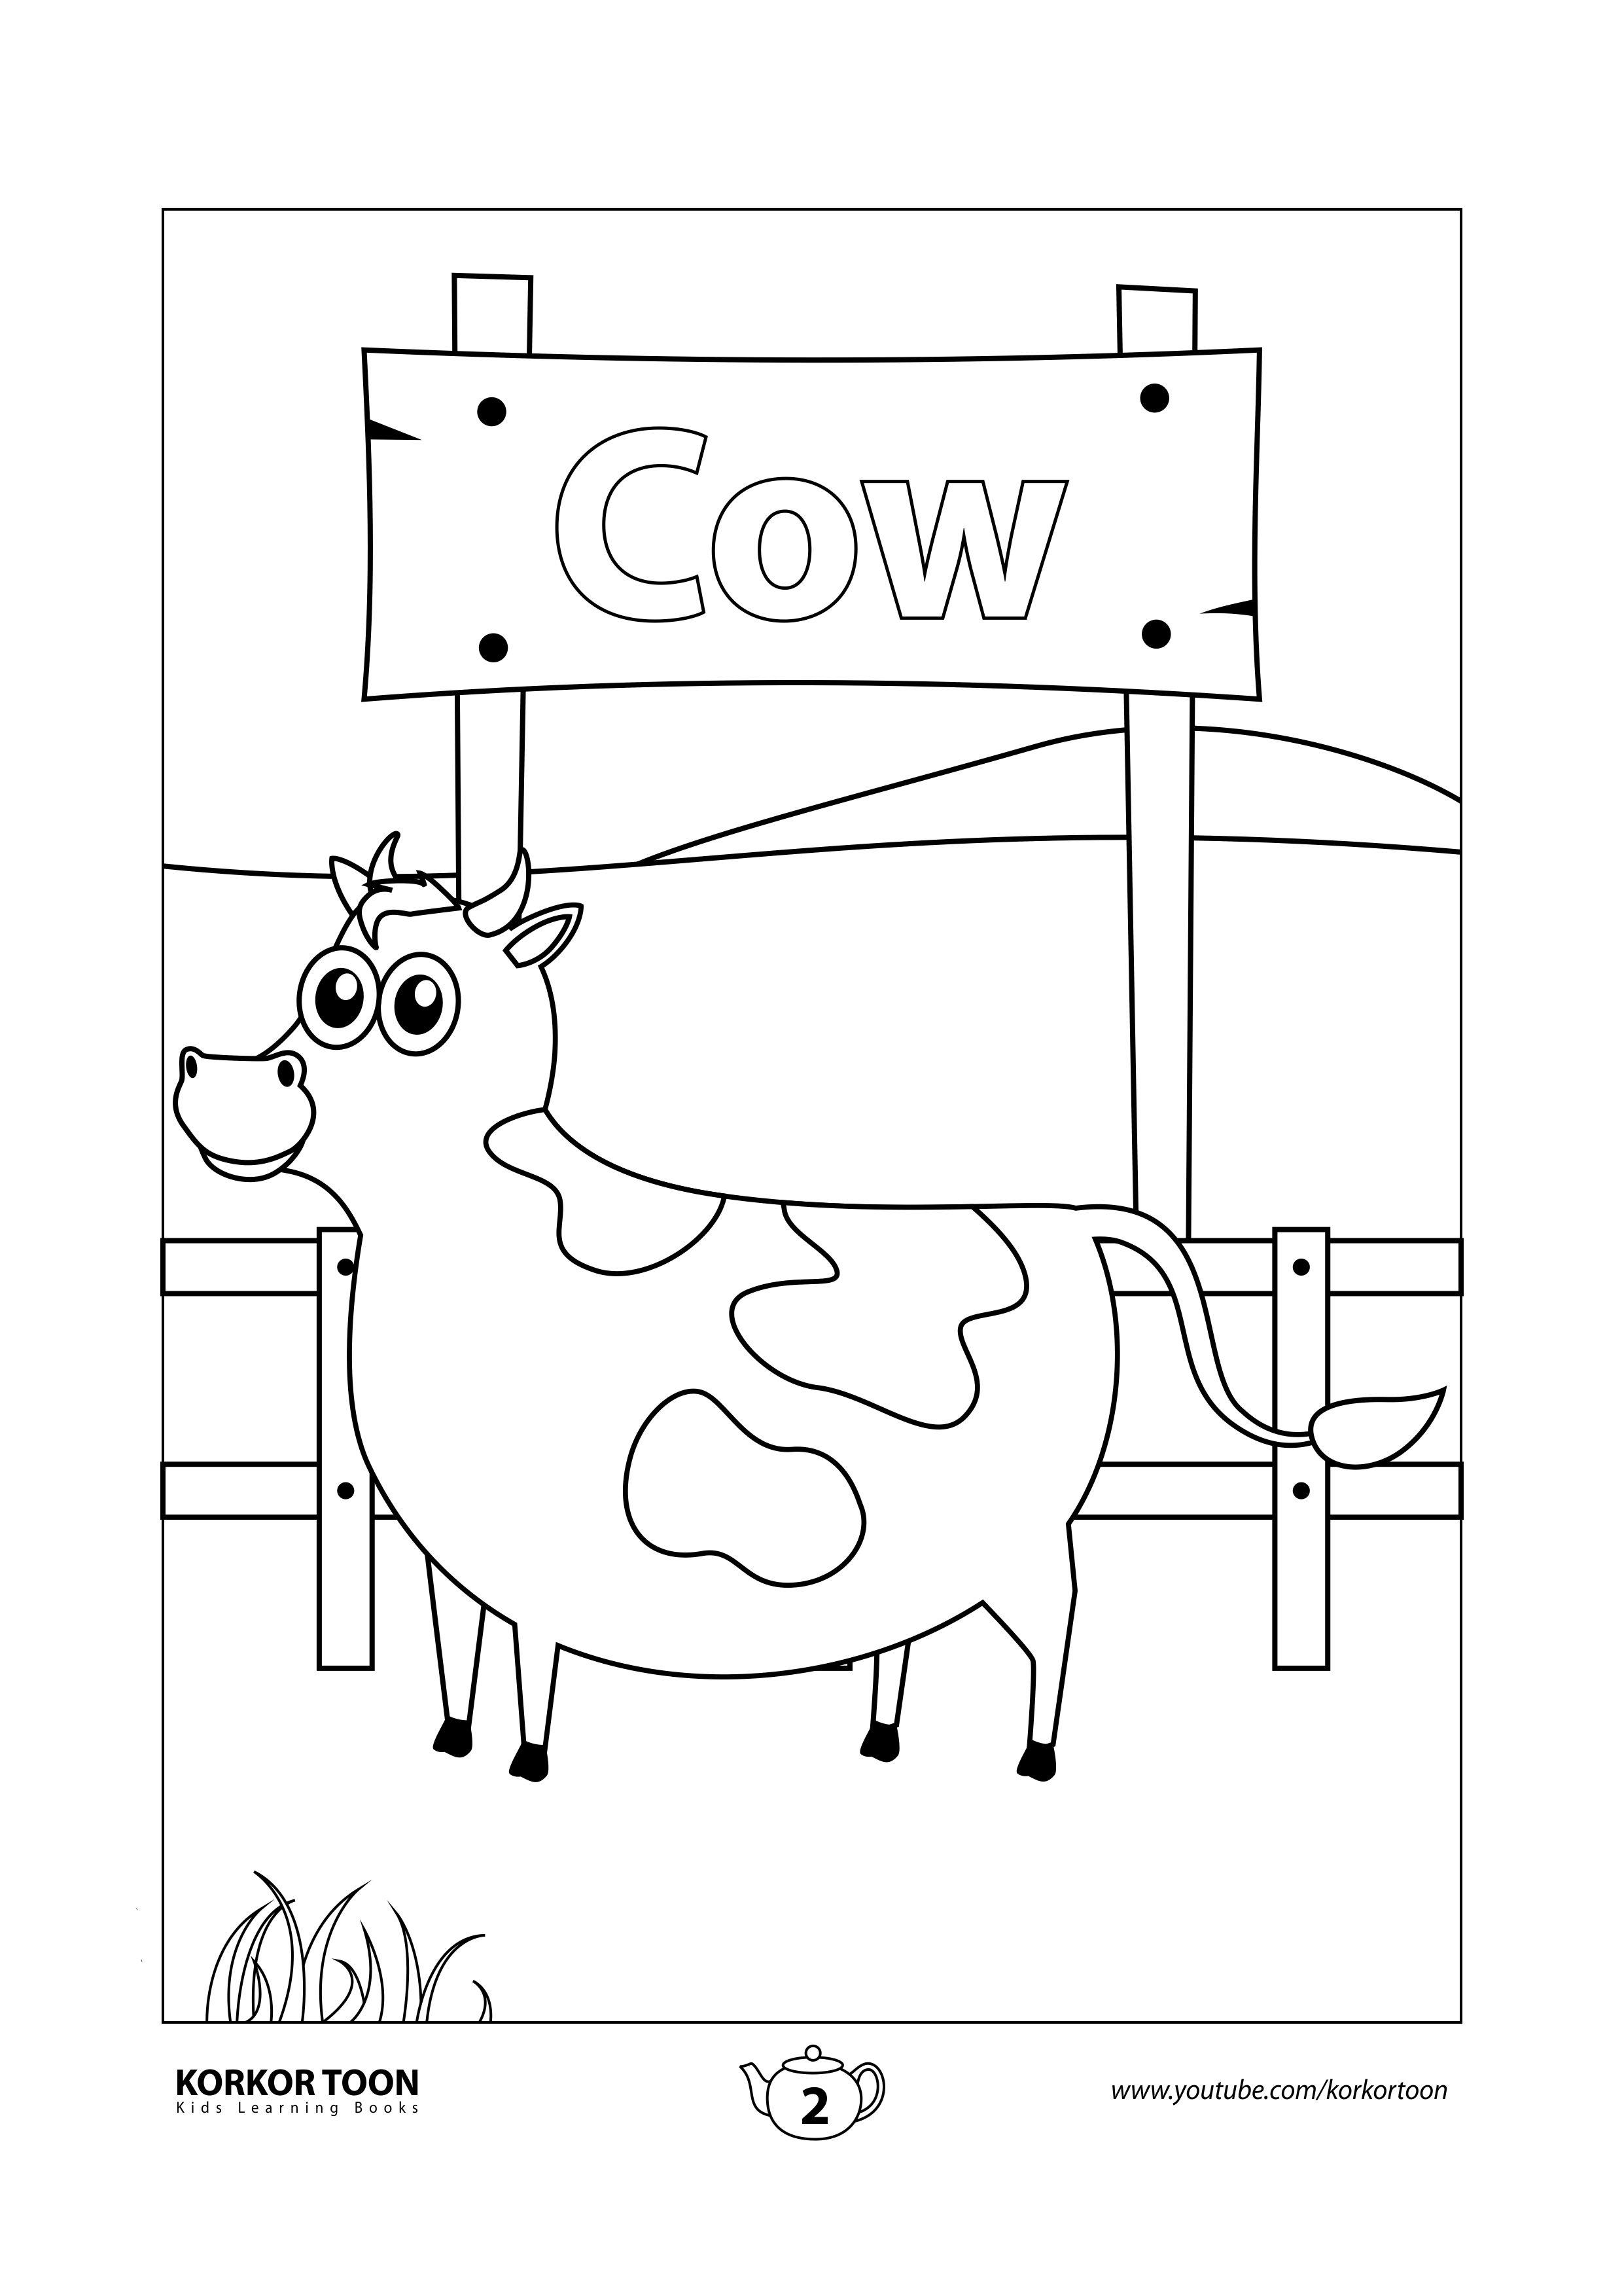 Cow Coloring Page Farm Animals Coloring Book Kindergarten Worksheets Printable Kindergarten Coloring Pages Writing Worksheets Kindergarten [ 3508 x 2482 Pixel ]